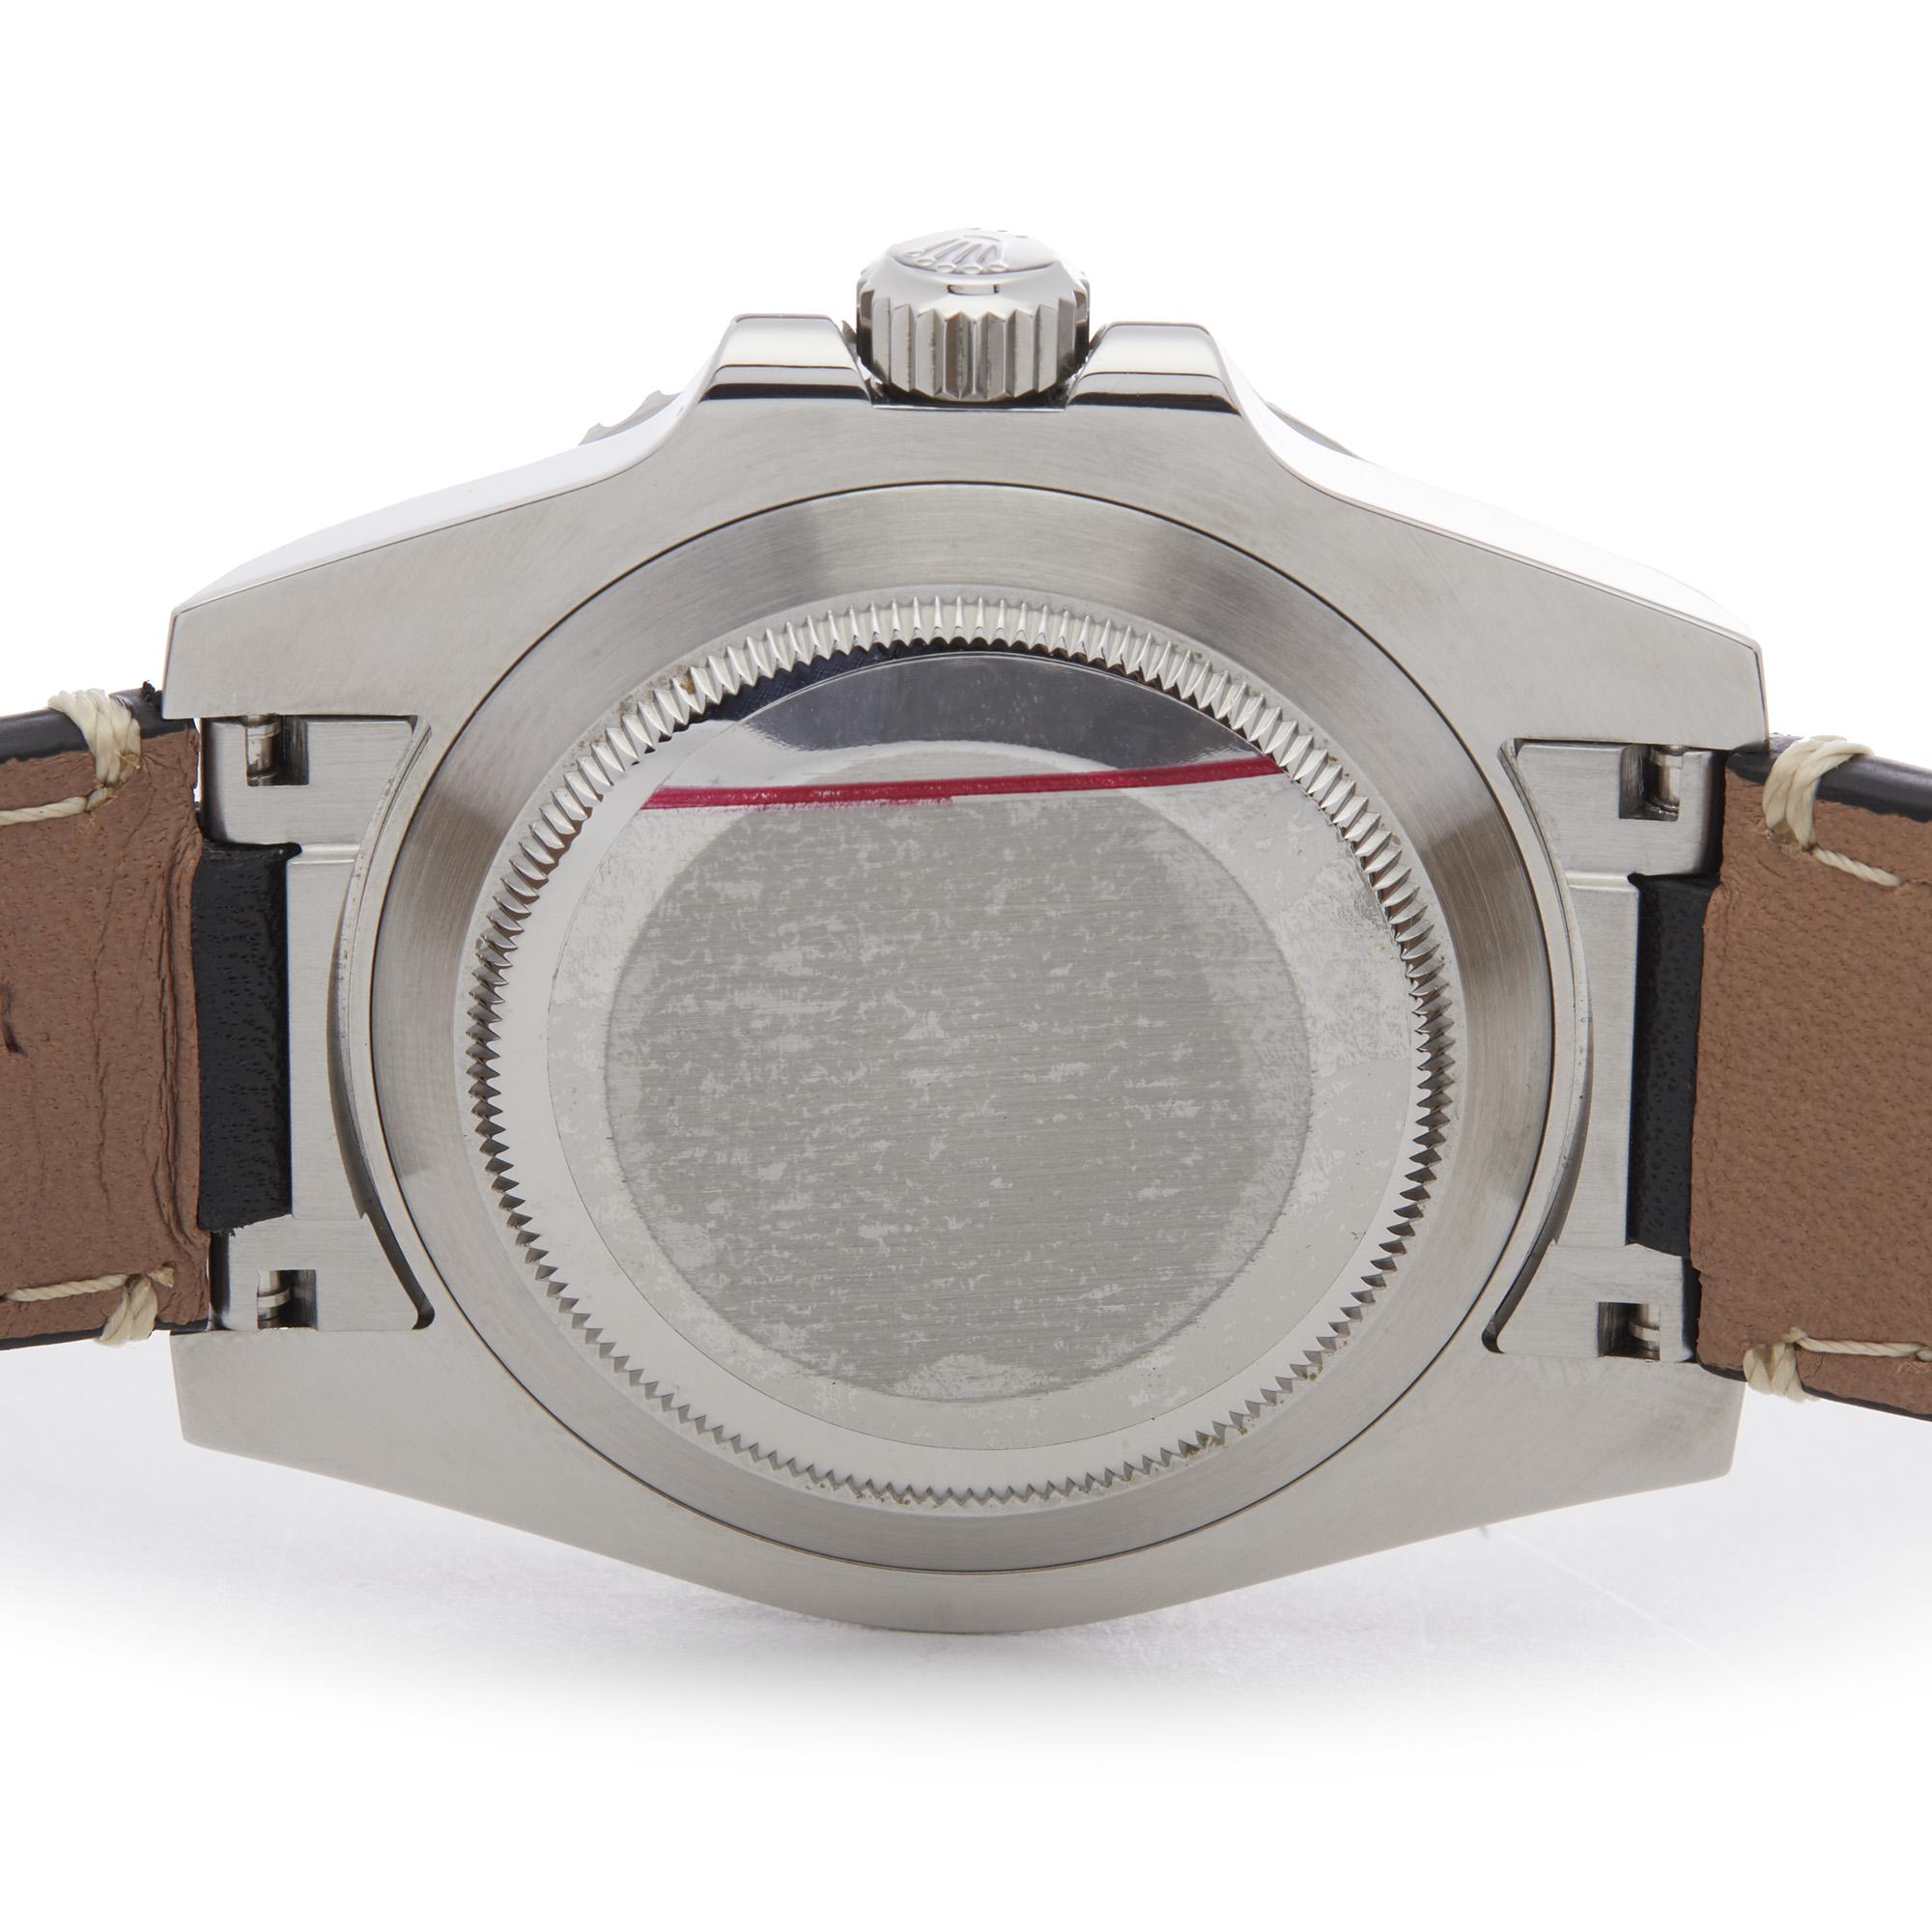 Rolex Submariner No Date 114060 Men Stainless Steel Watch - Image 4 of 8